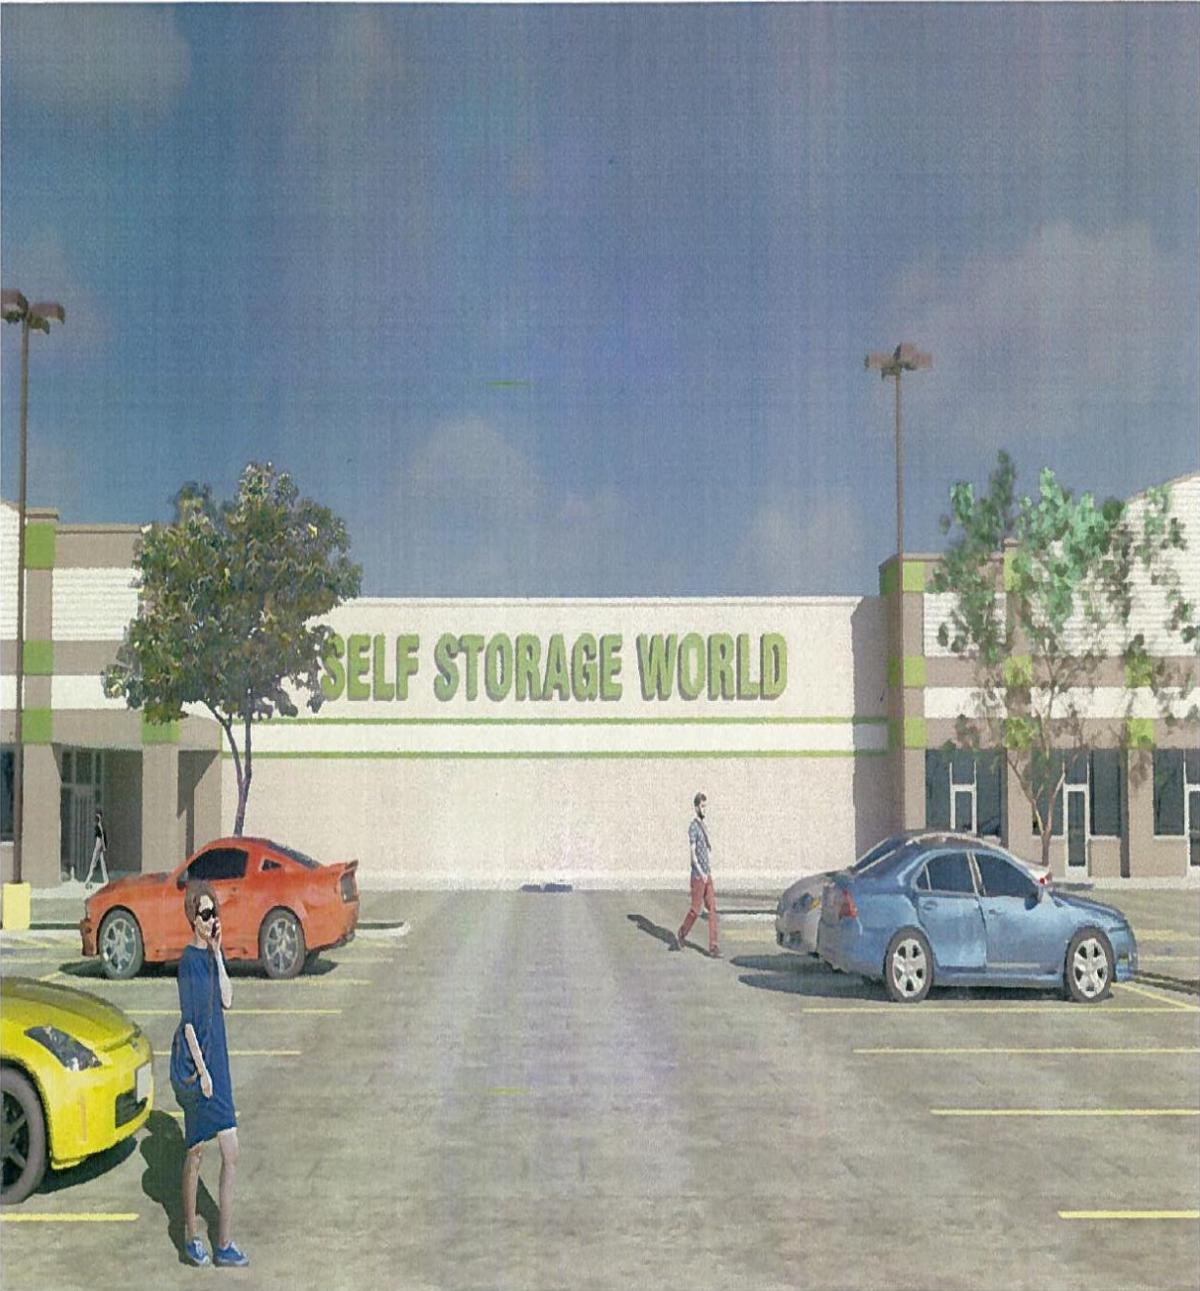 A rendering of self-storage in an old Walmart